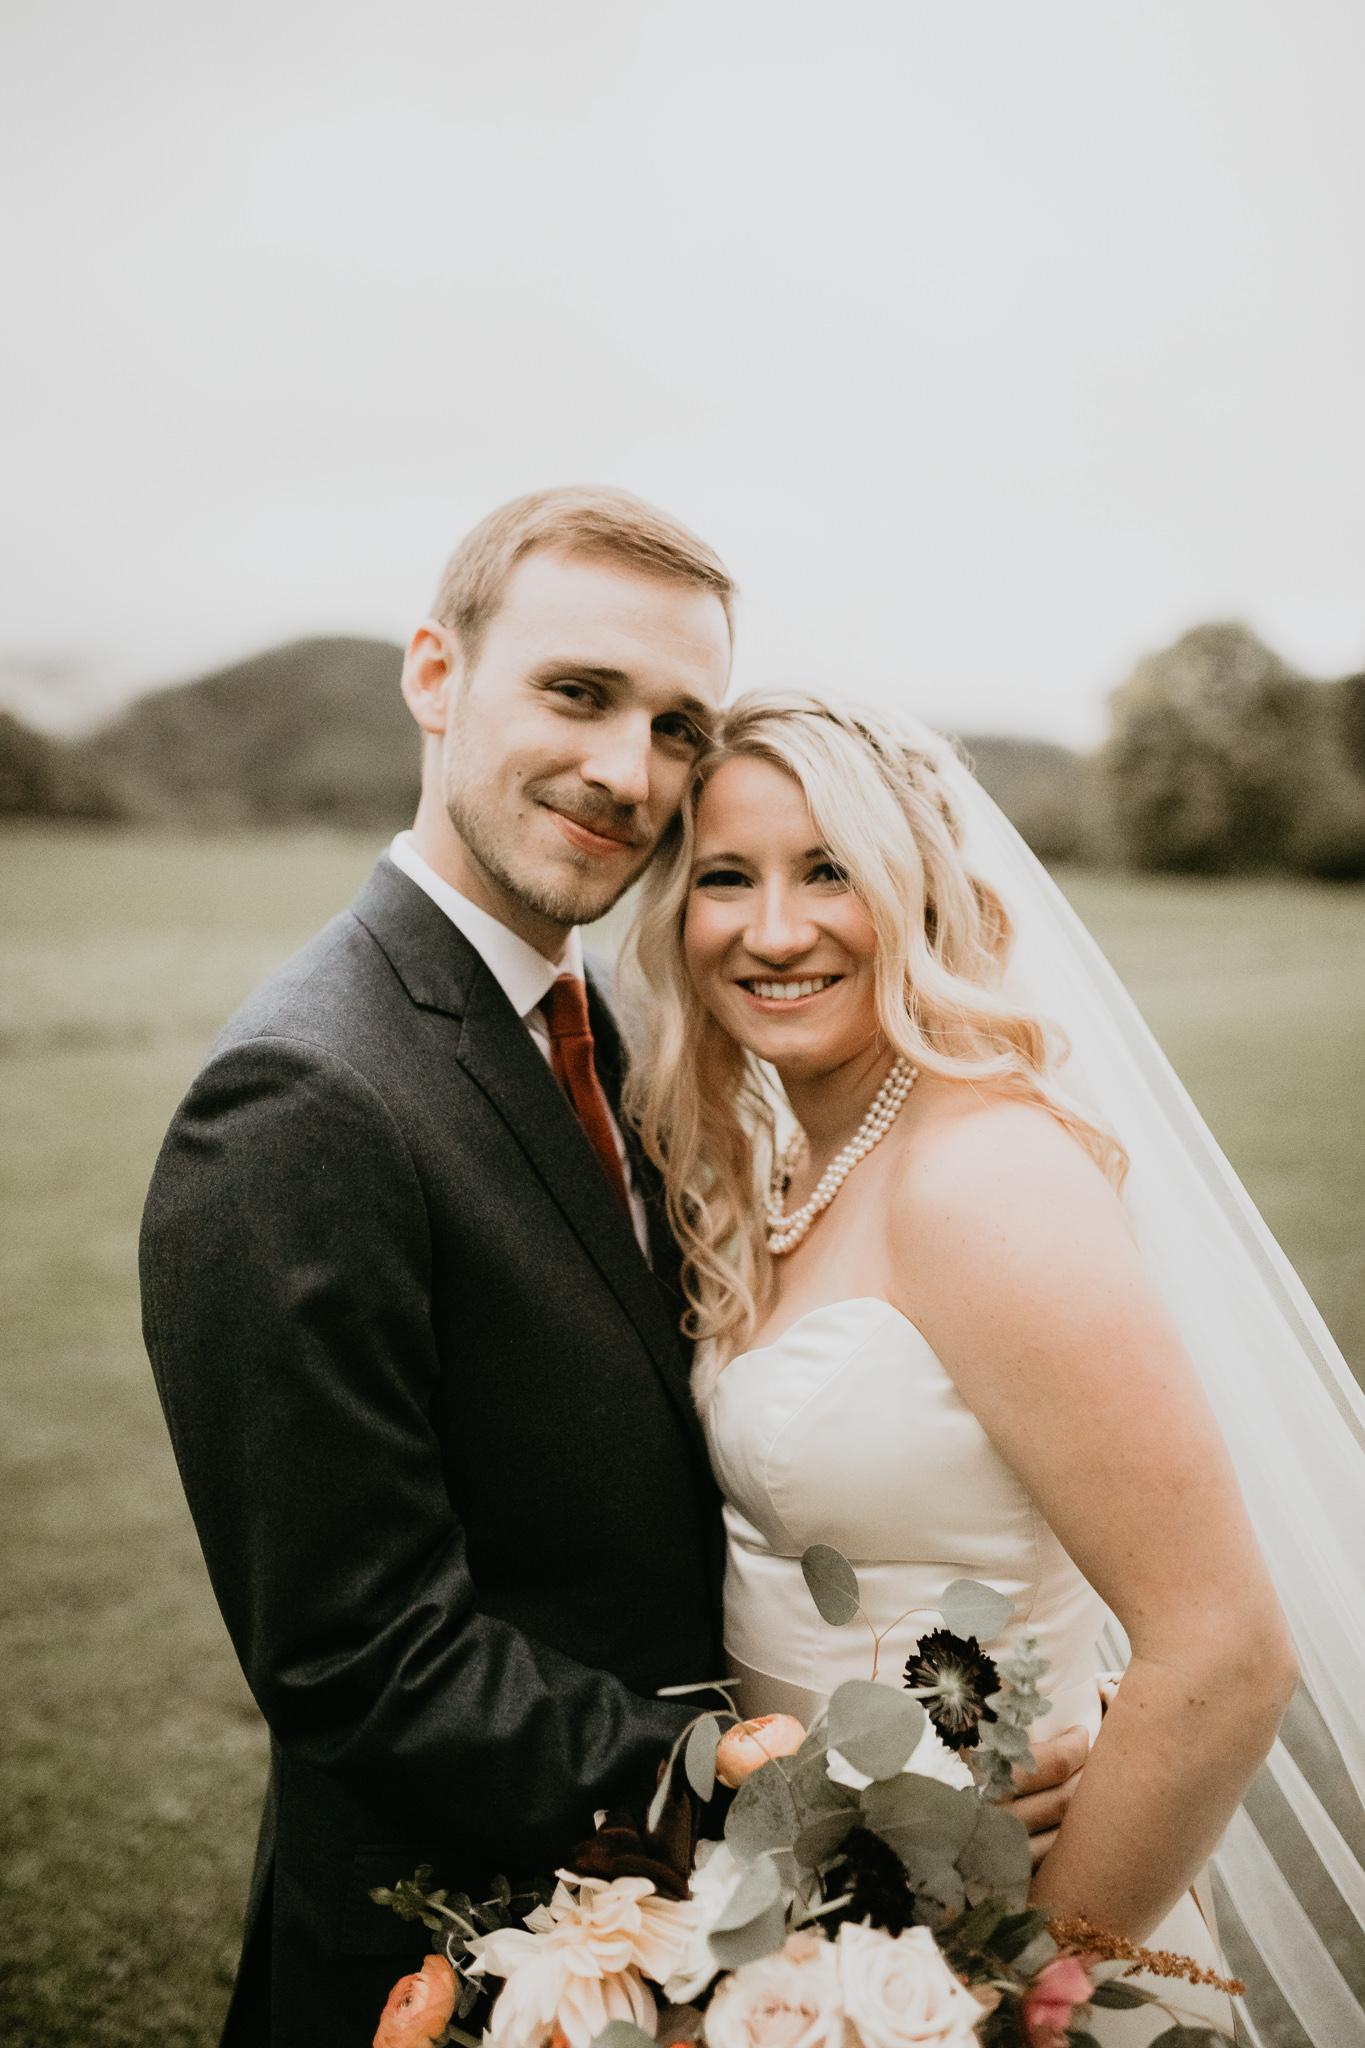 Sundara - Weddings - Virginia - Best Wedding Photographer - Pat Cori Photography-77.jpg